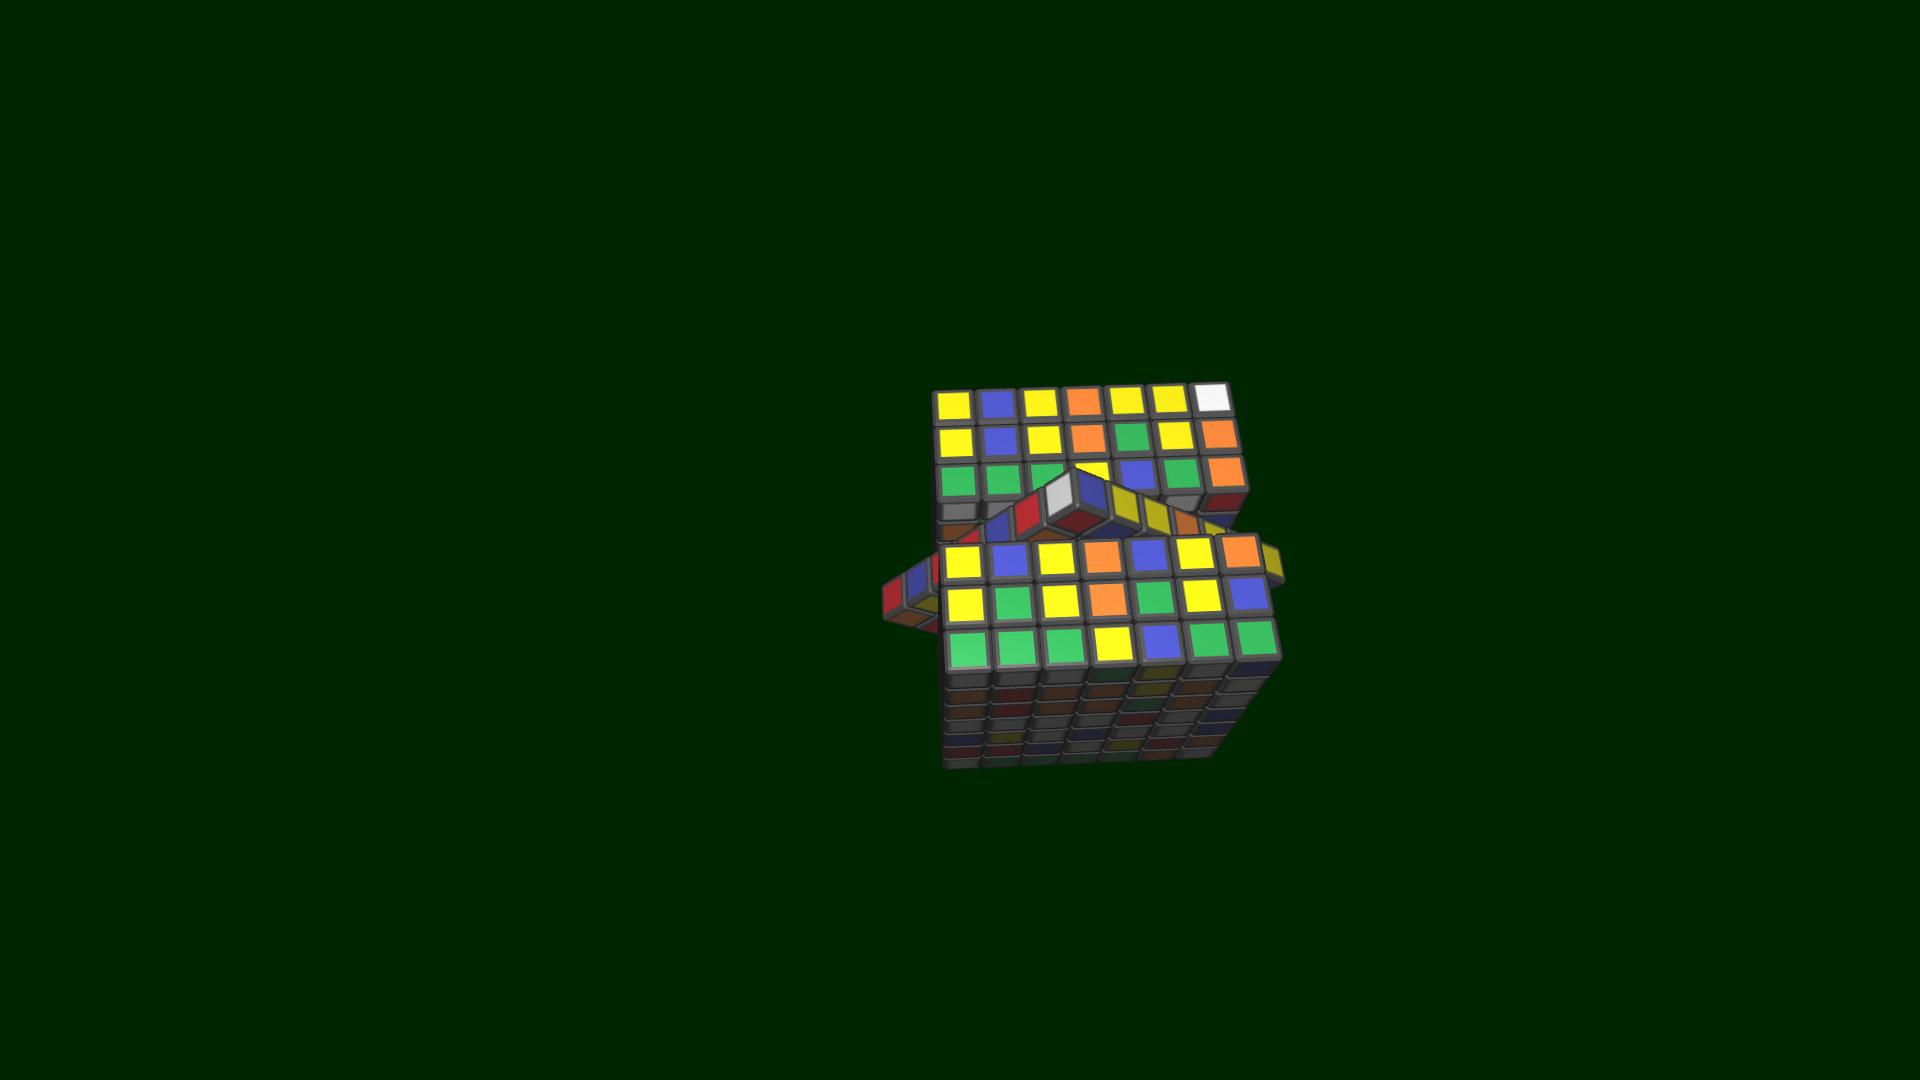 3d Rubiks Screensaver For Windows Free 3d Screensaver